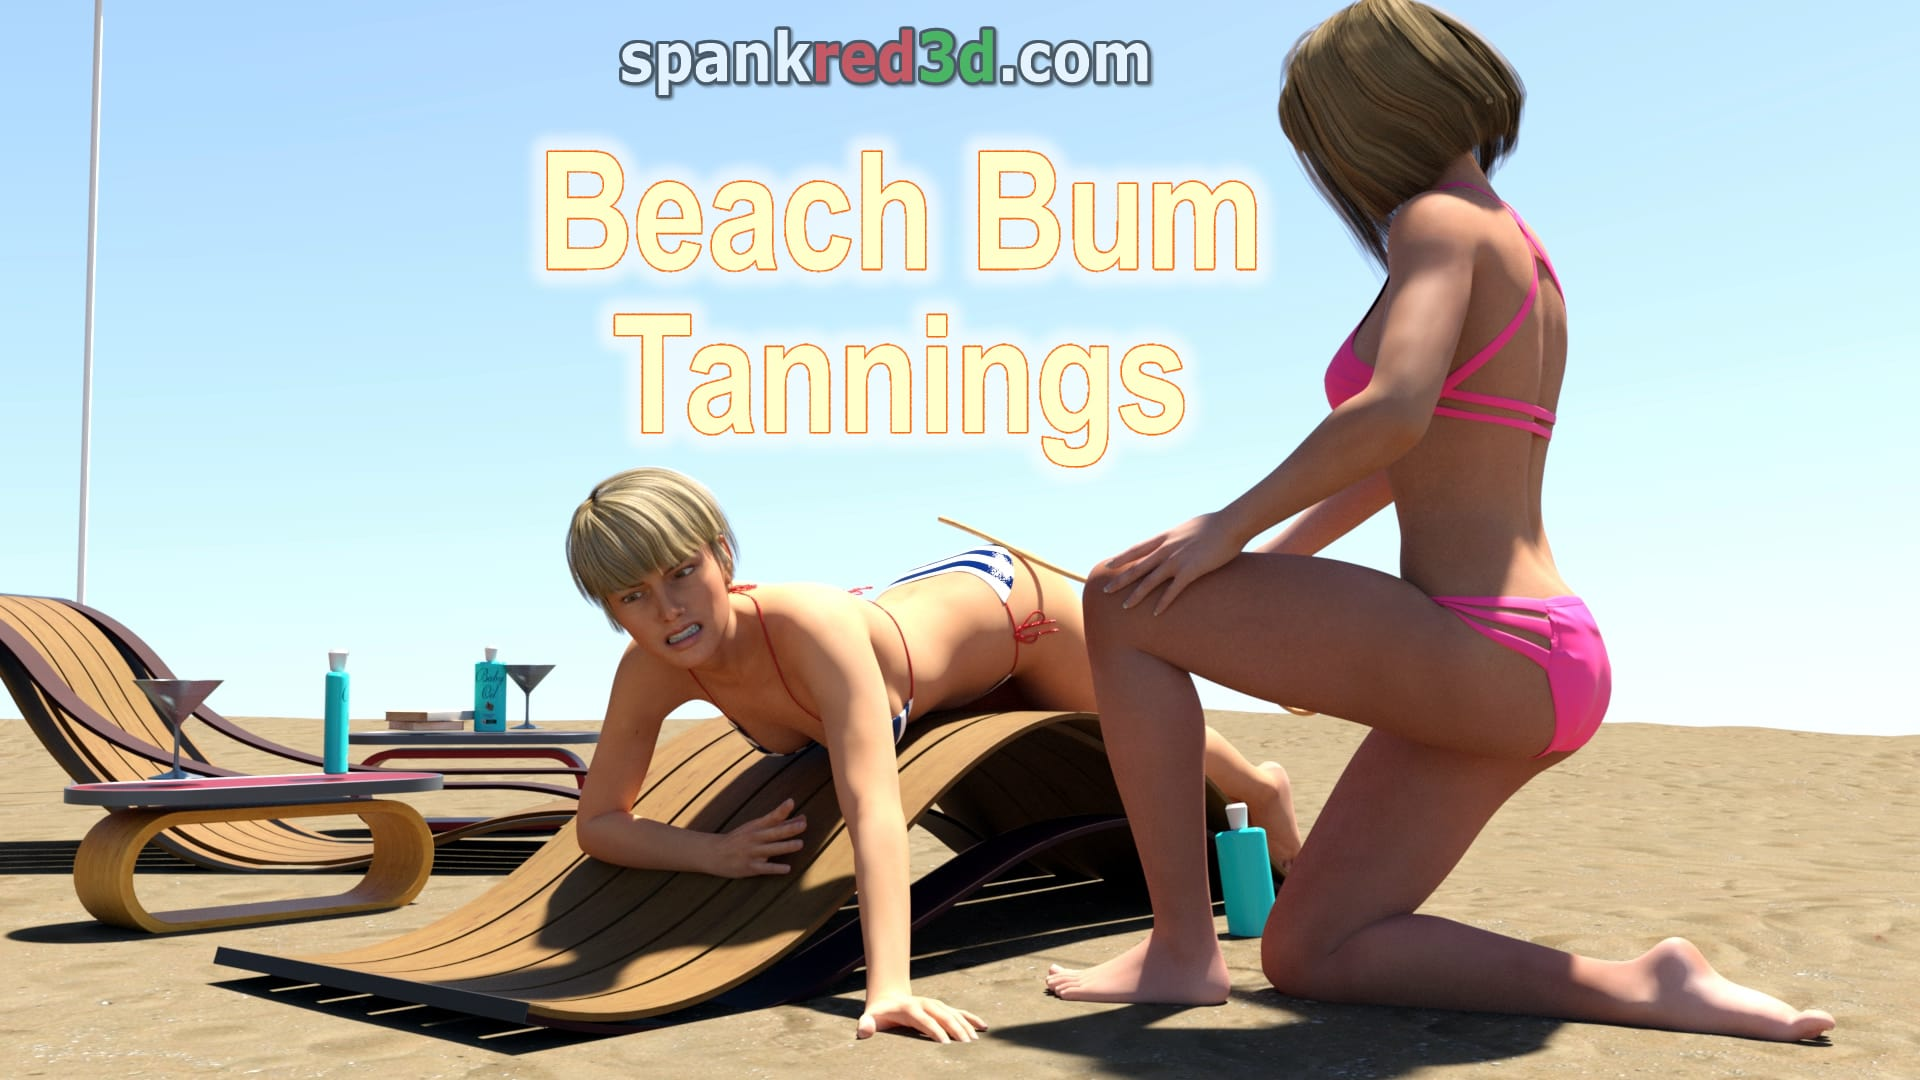 Beach Bum caning with naughty suntanned teen girs bottoms